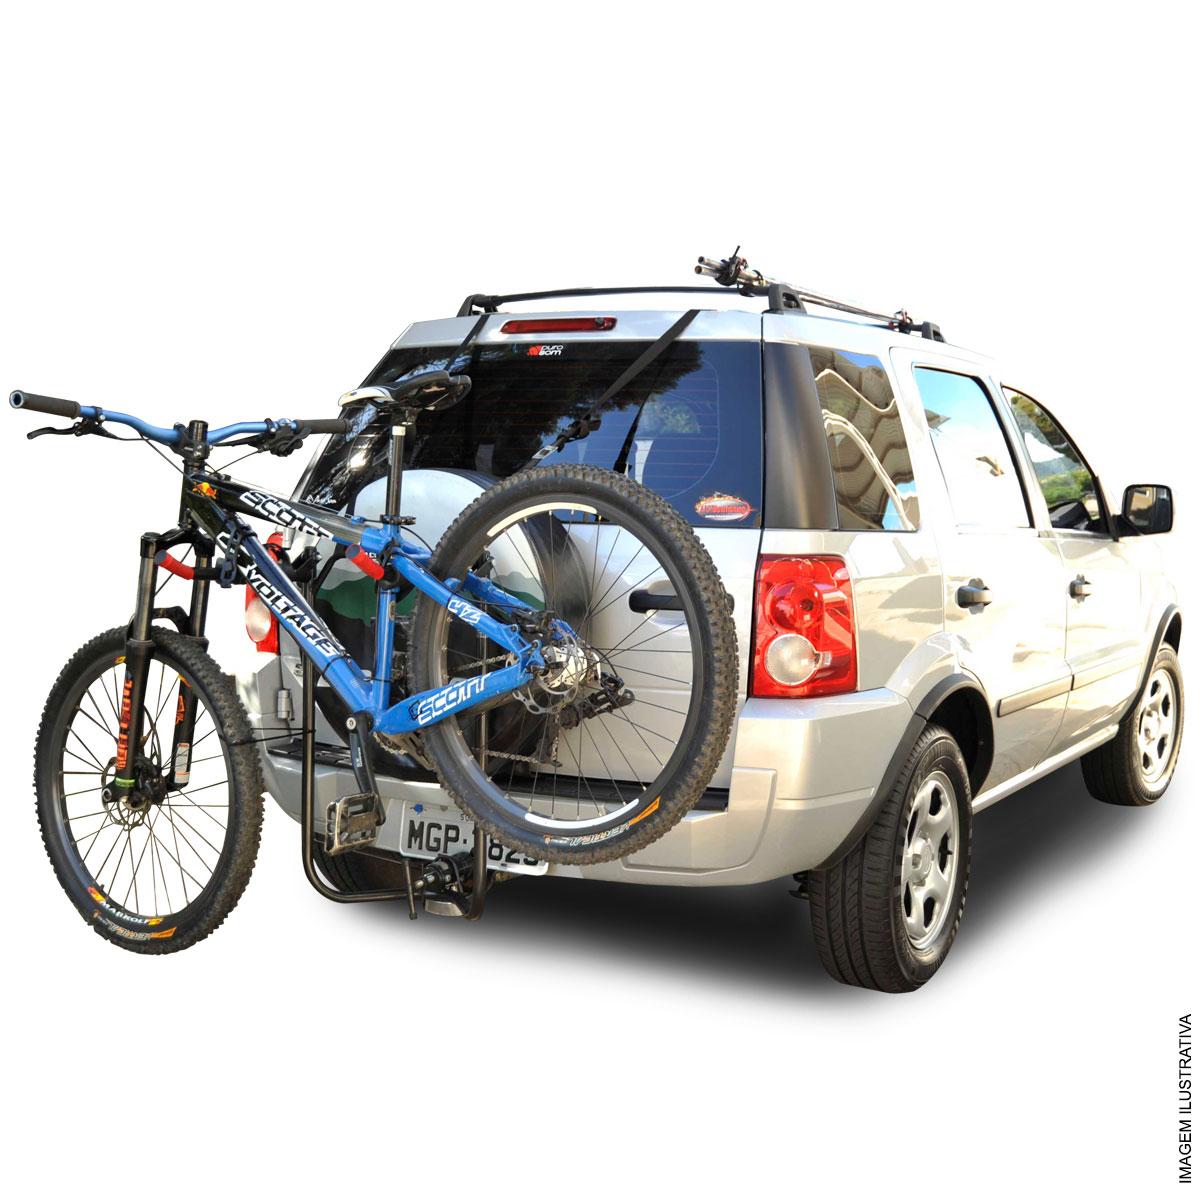 Transbike Crossfox 2005 a 2017 fixado no engate de reboque para 3 bicicletas